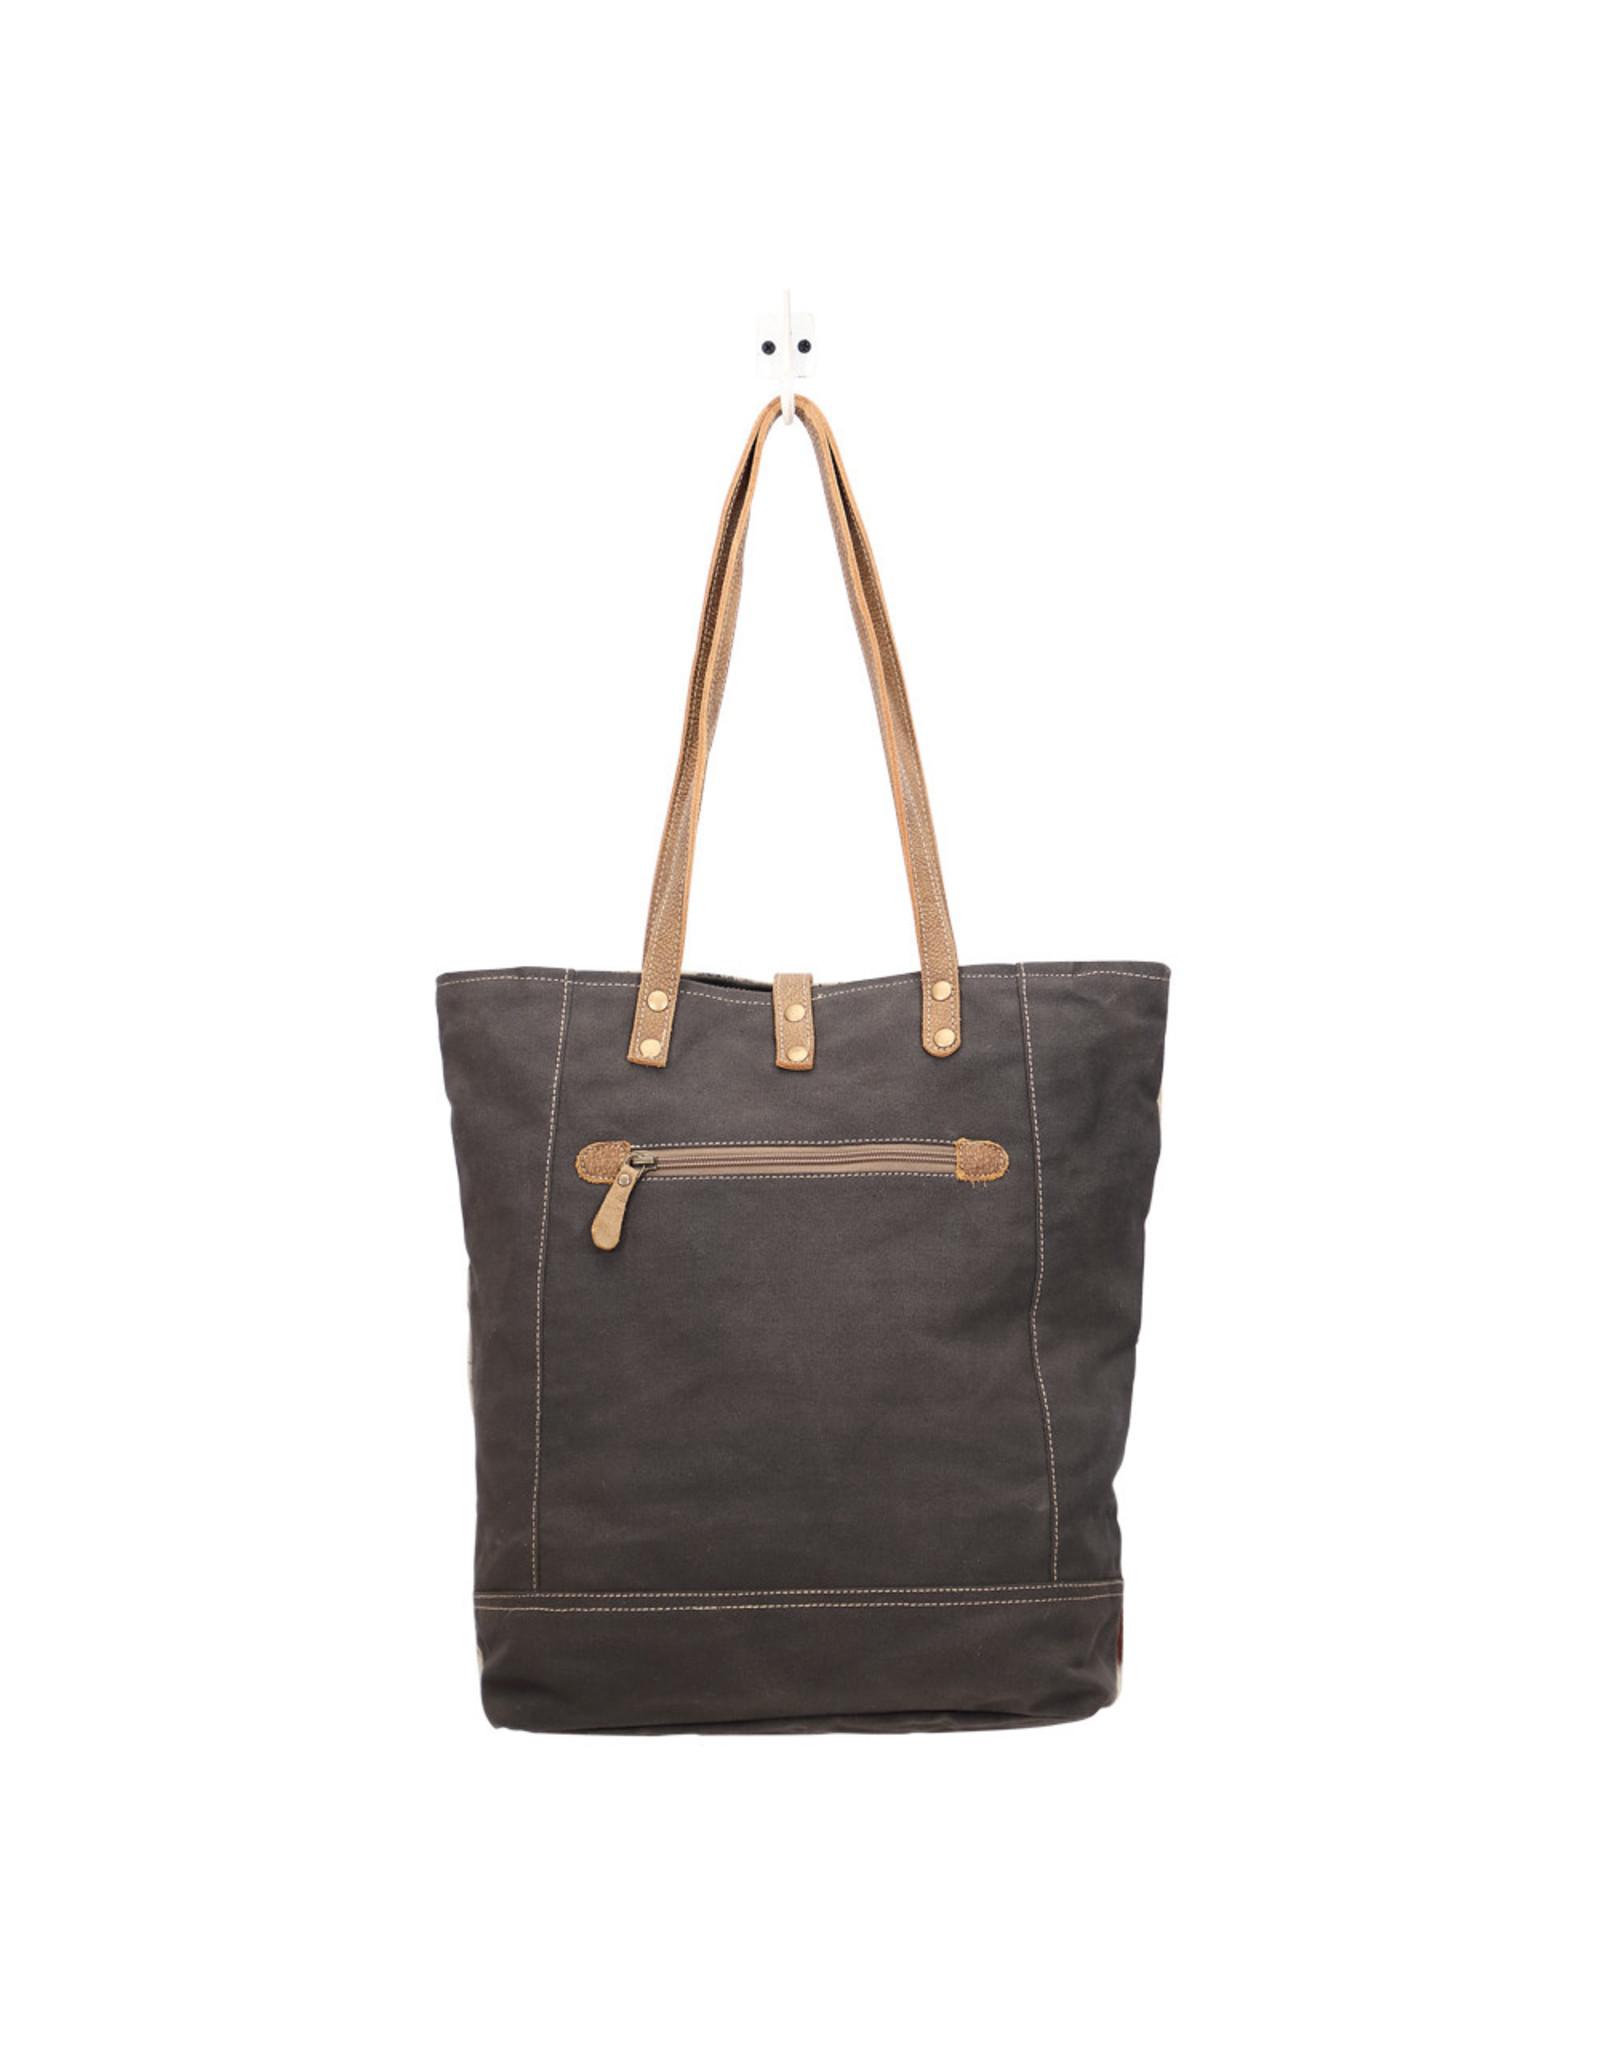 Myra Bags S-1440 Petiole Tote Bag